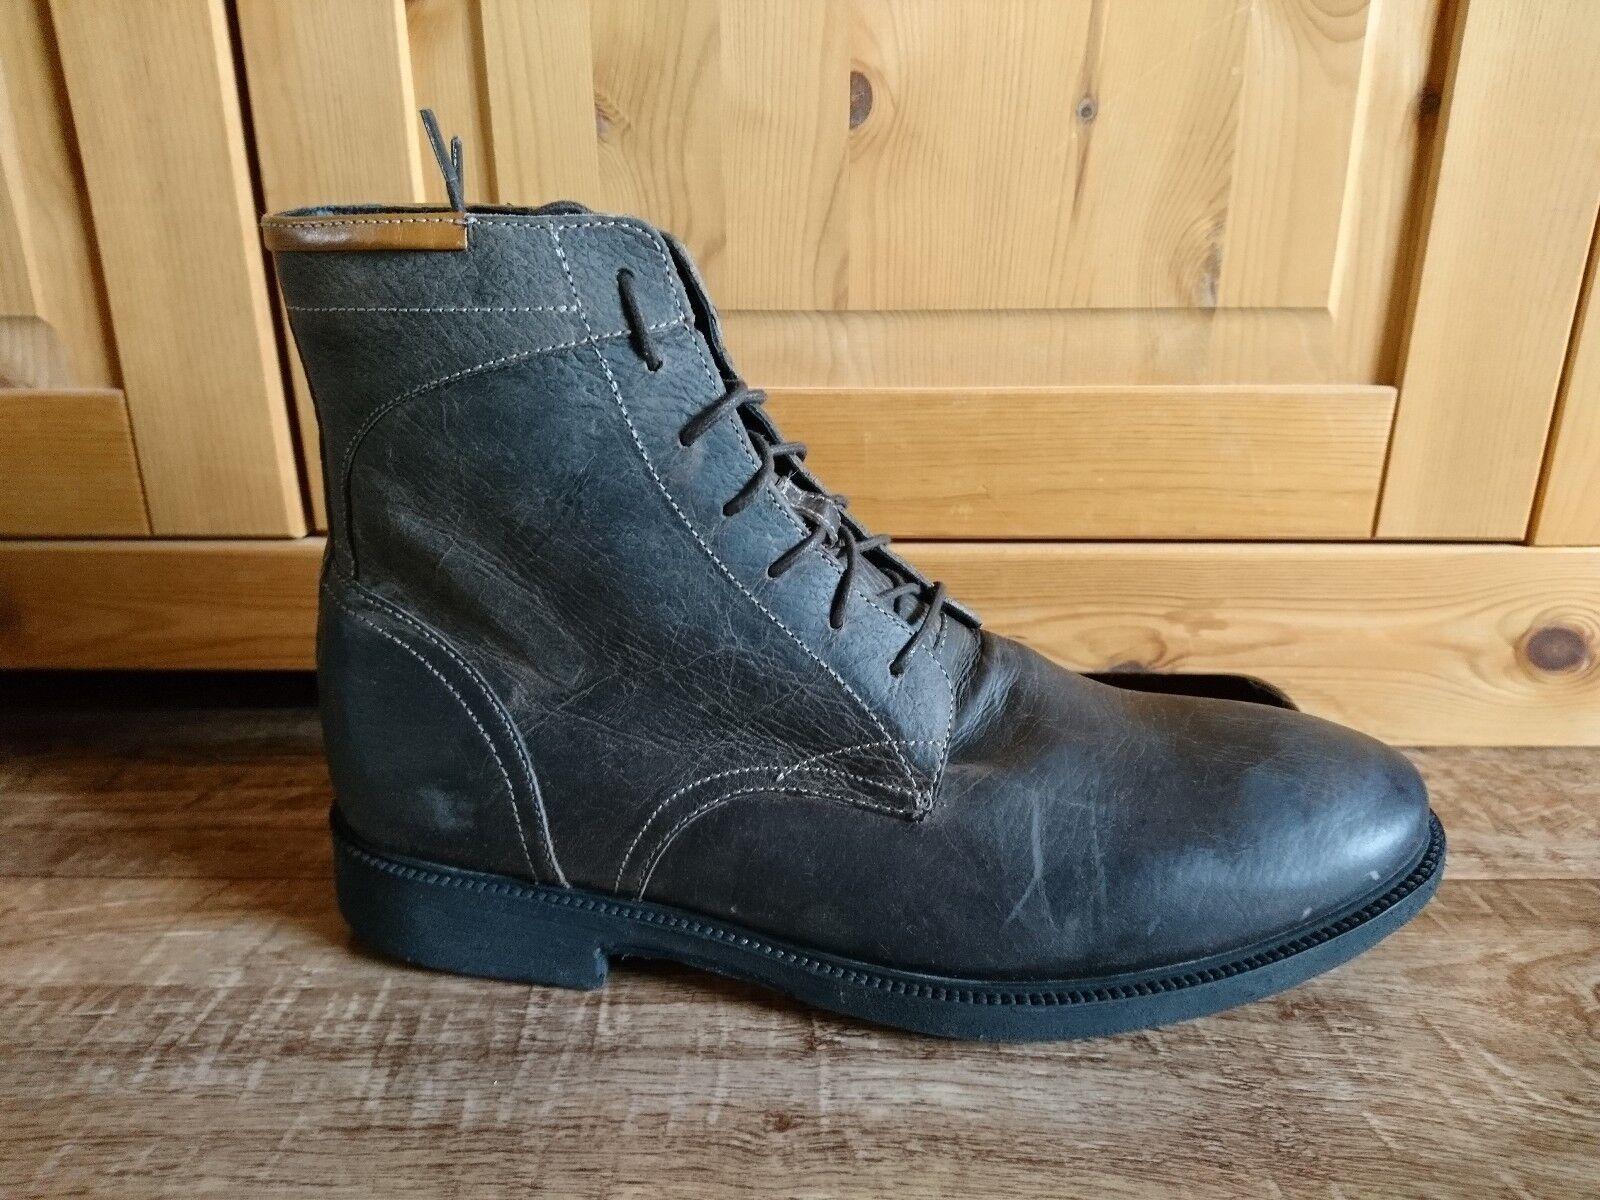 J Shoes Modell Barbican Herren Schuhe Stiefel Boots Stiefeletten Braun Leder NEU